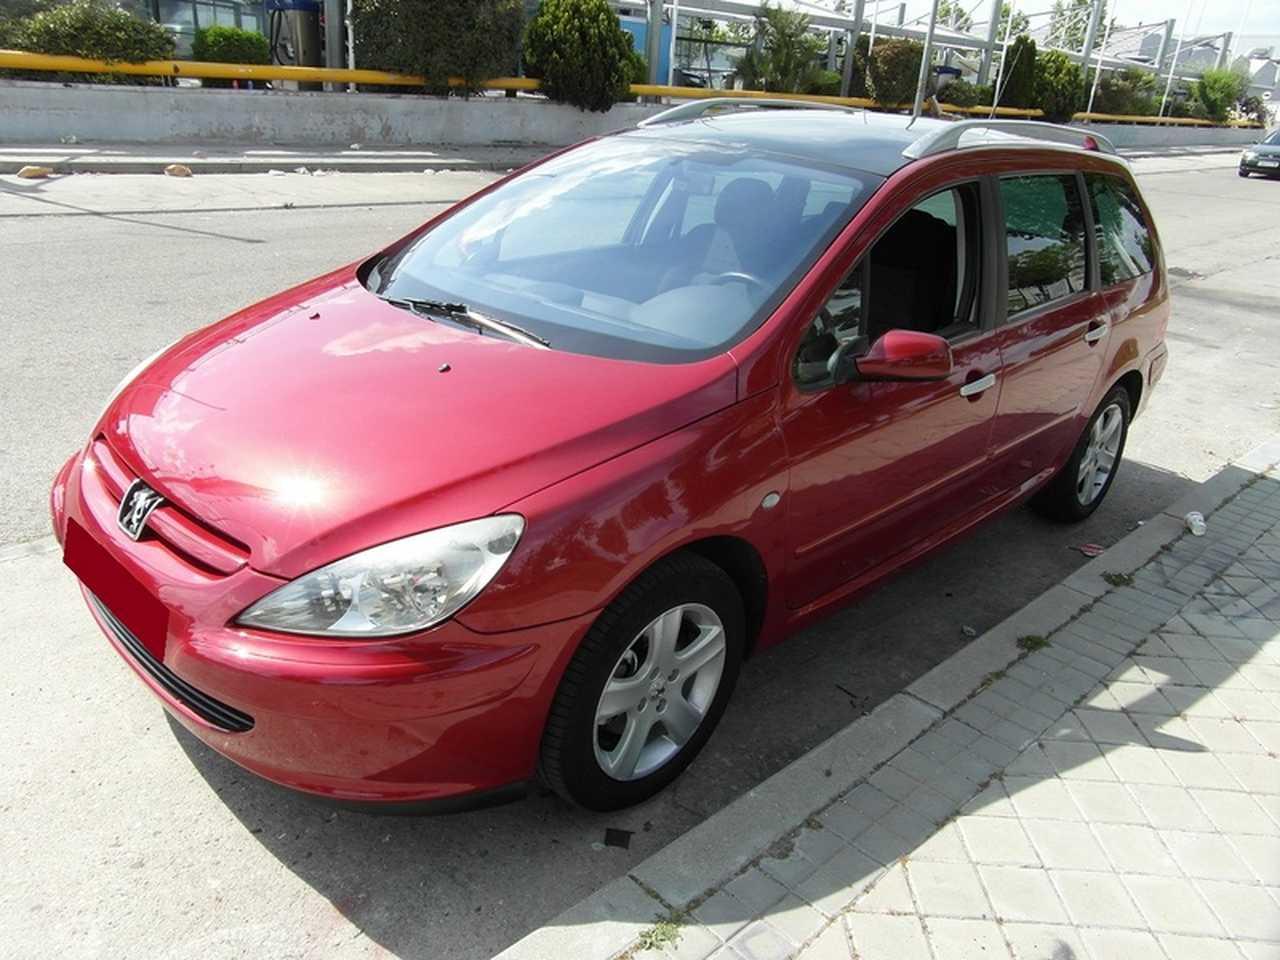 Peugeot 307 SW 2.0 HDI 110 CV MUY CUIDADO  - Foto 1